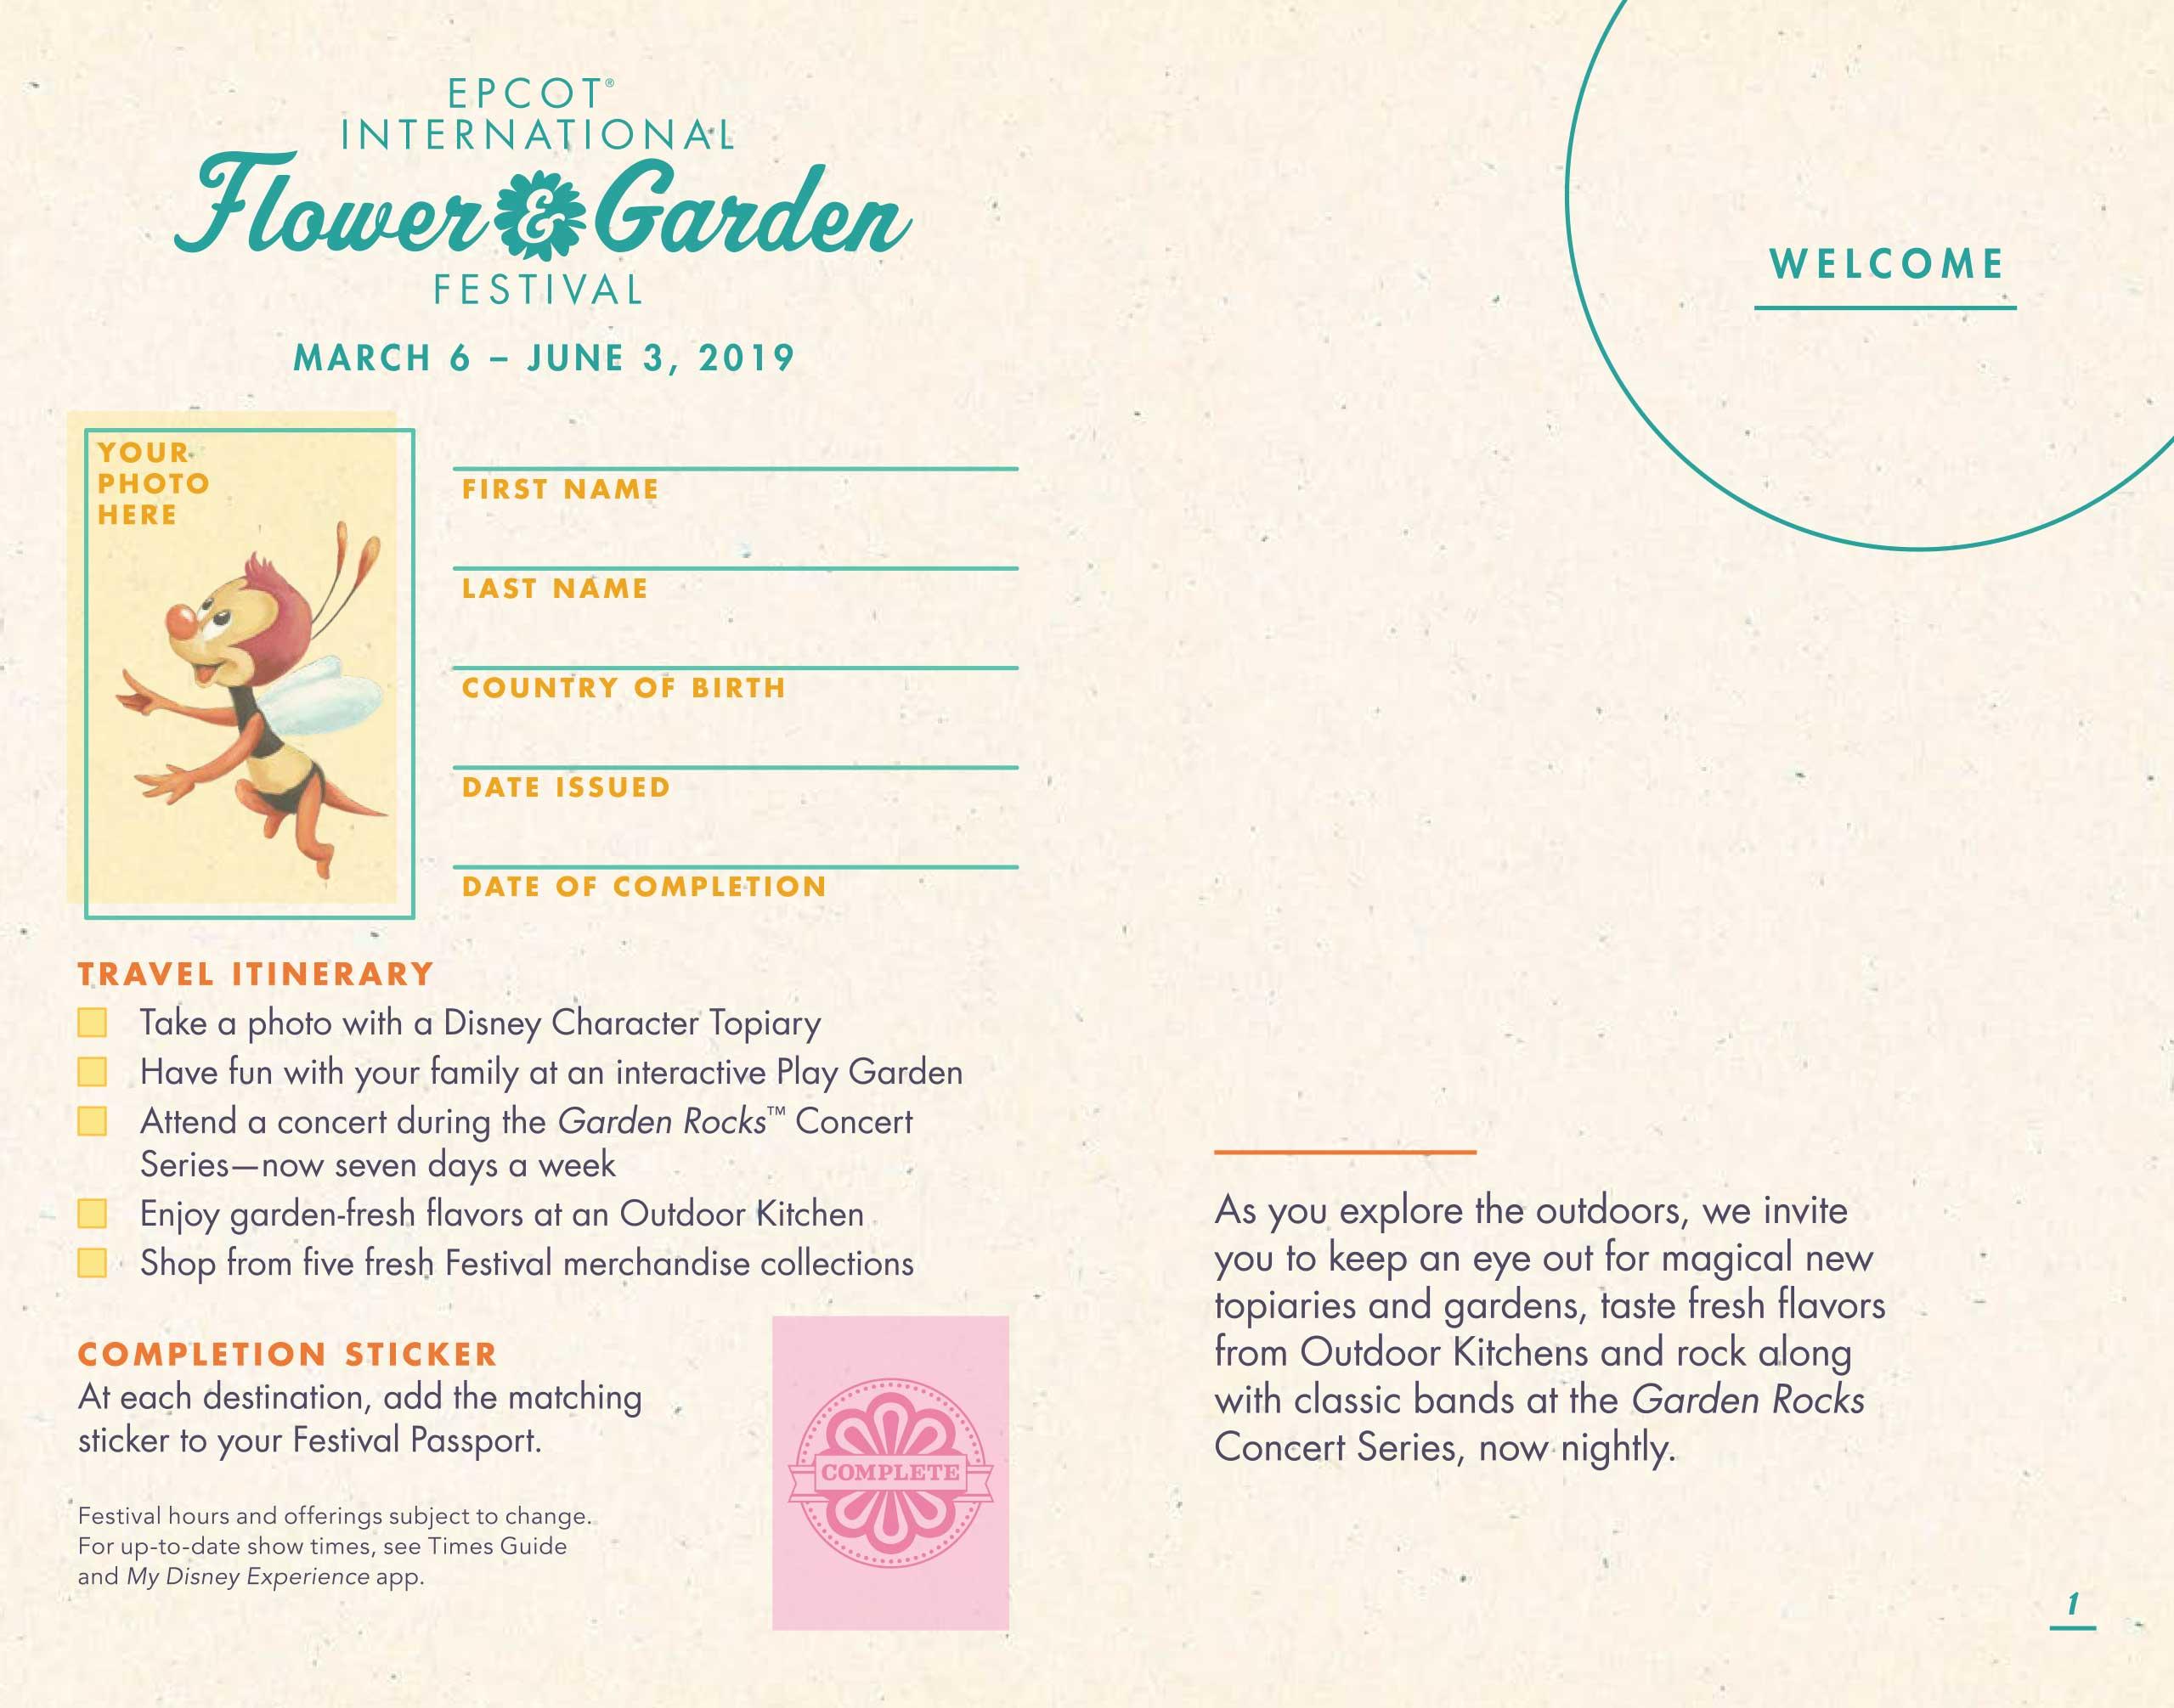 2019 epcot international flower and garden festival passport - photo